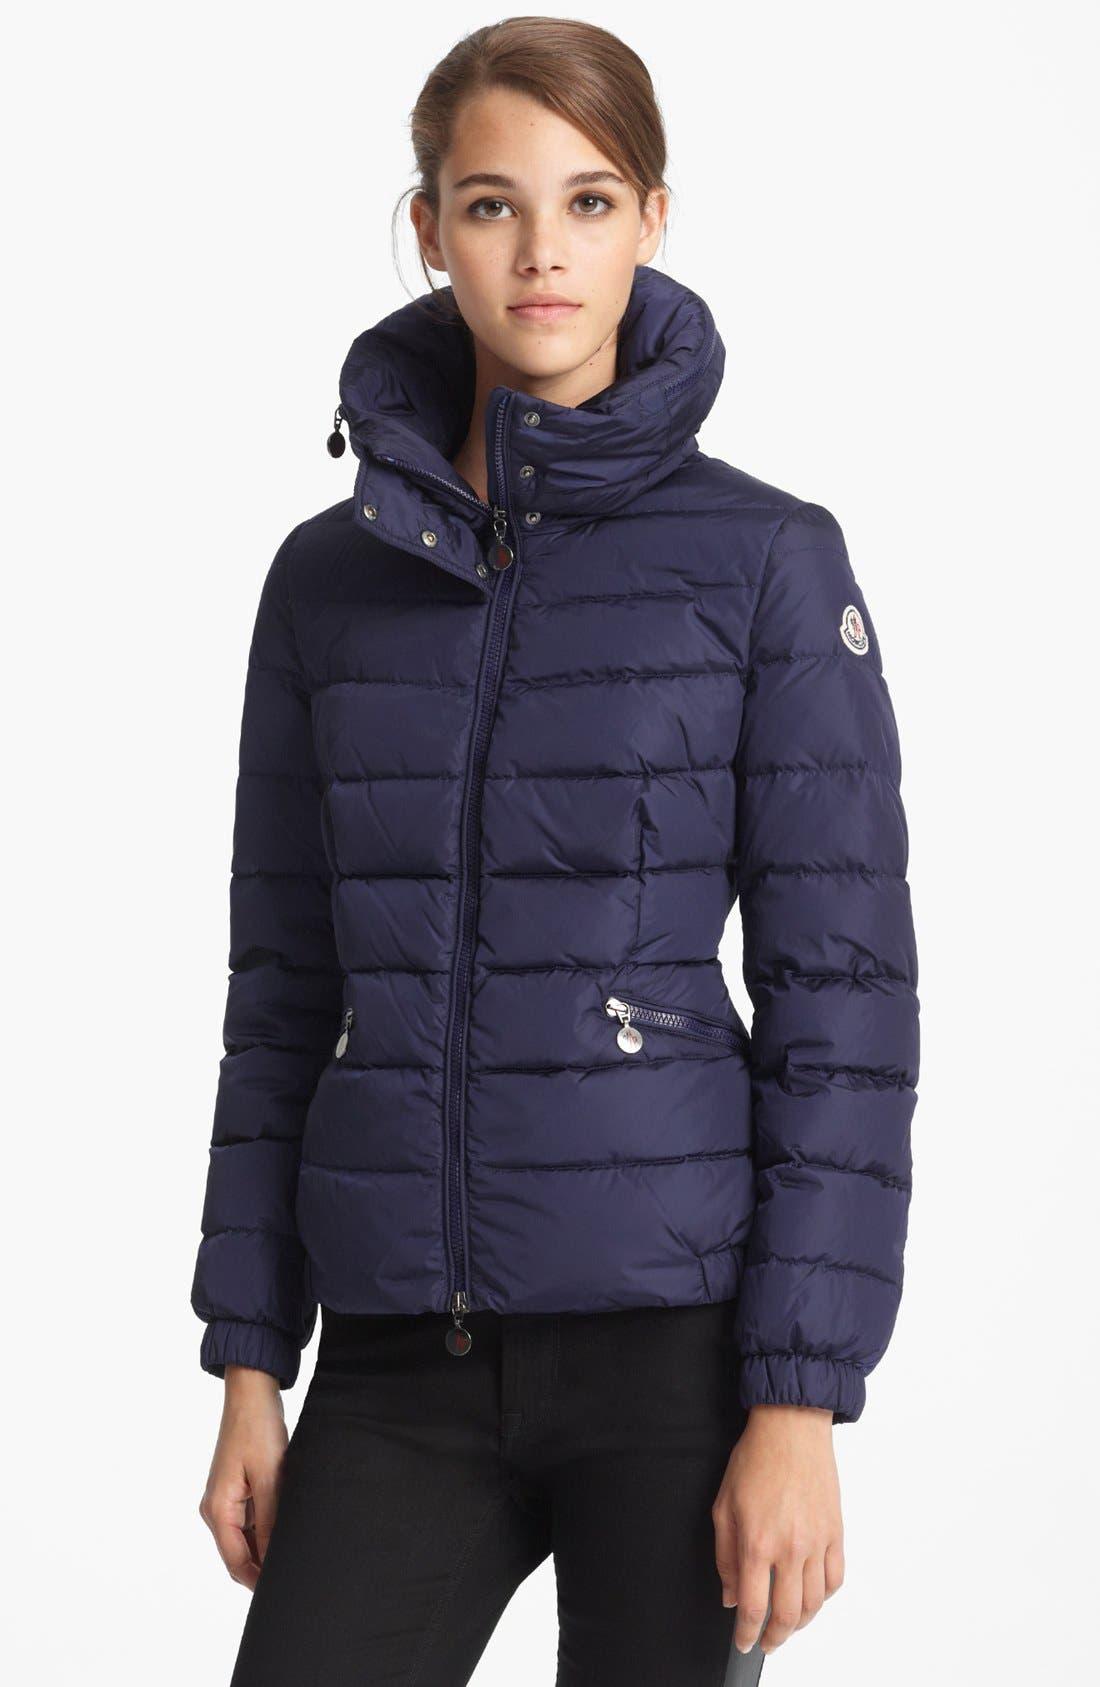 Alternate Image 1 Selected - Moncler 'Sanglier' Down Jacket